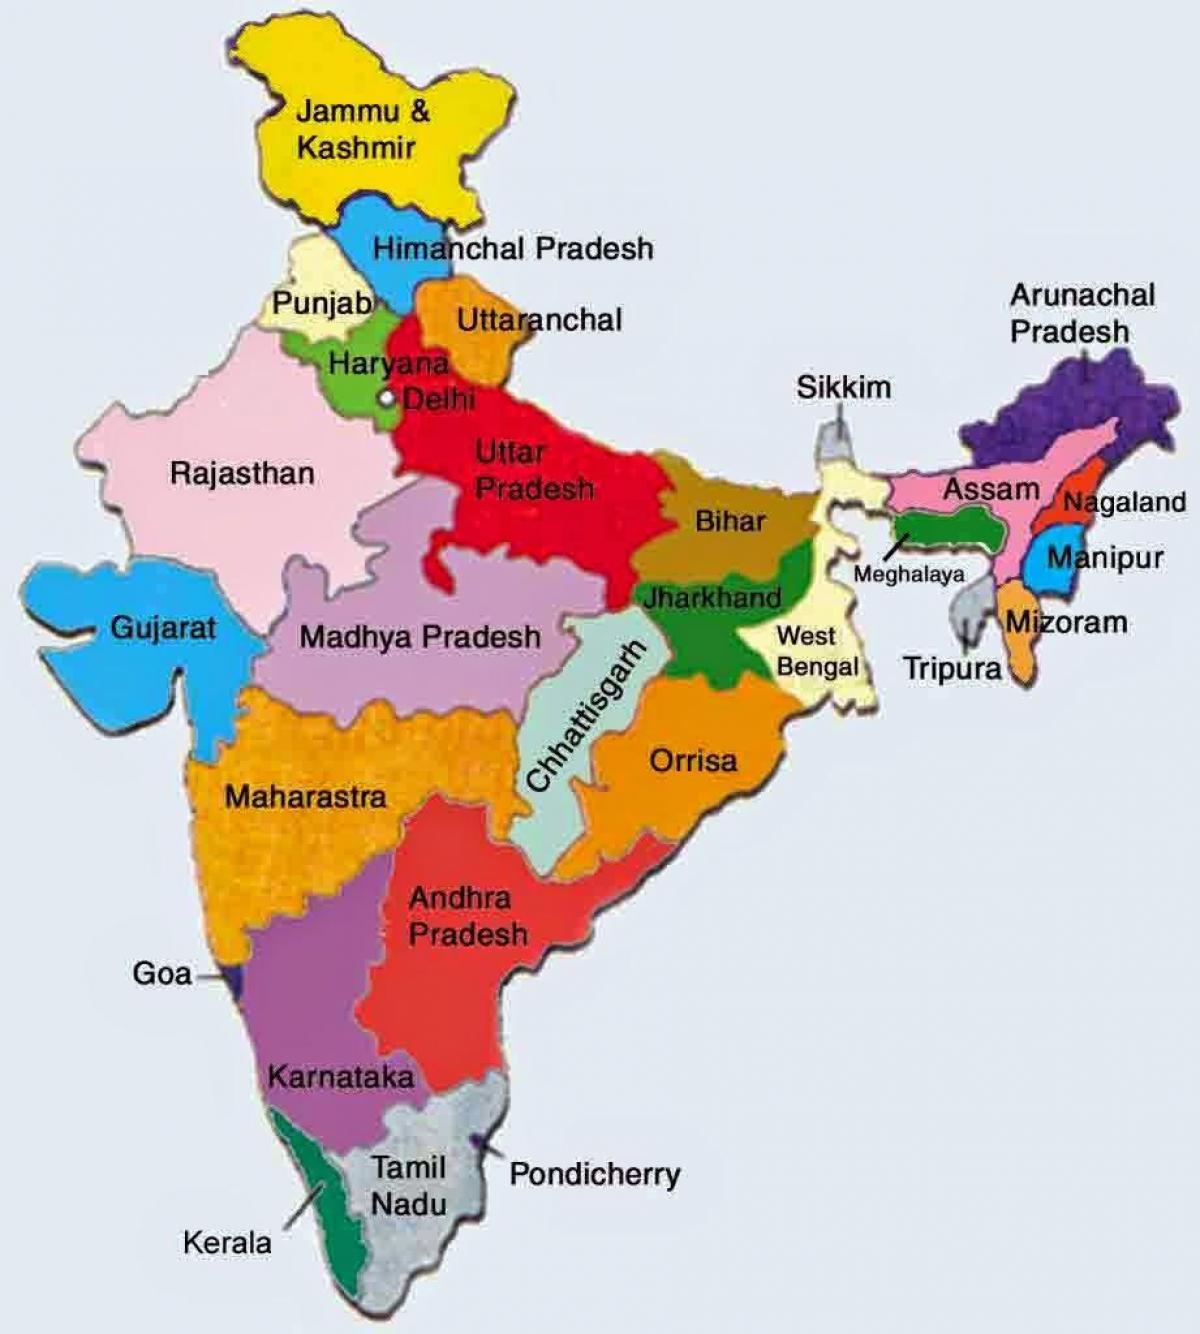 Show India map with states - India map and states (Southern ... on korea map, karnataka map, texas map, time zone map, europe map, maharashtra map, indian subcontinent map, arabian sea map, california map, japan map, france map, andhra pradesh map, sri lanka map, canada map, russia map, australia map, china map, brazil map, africa map,